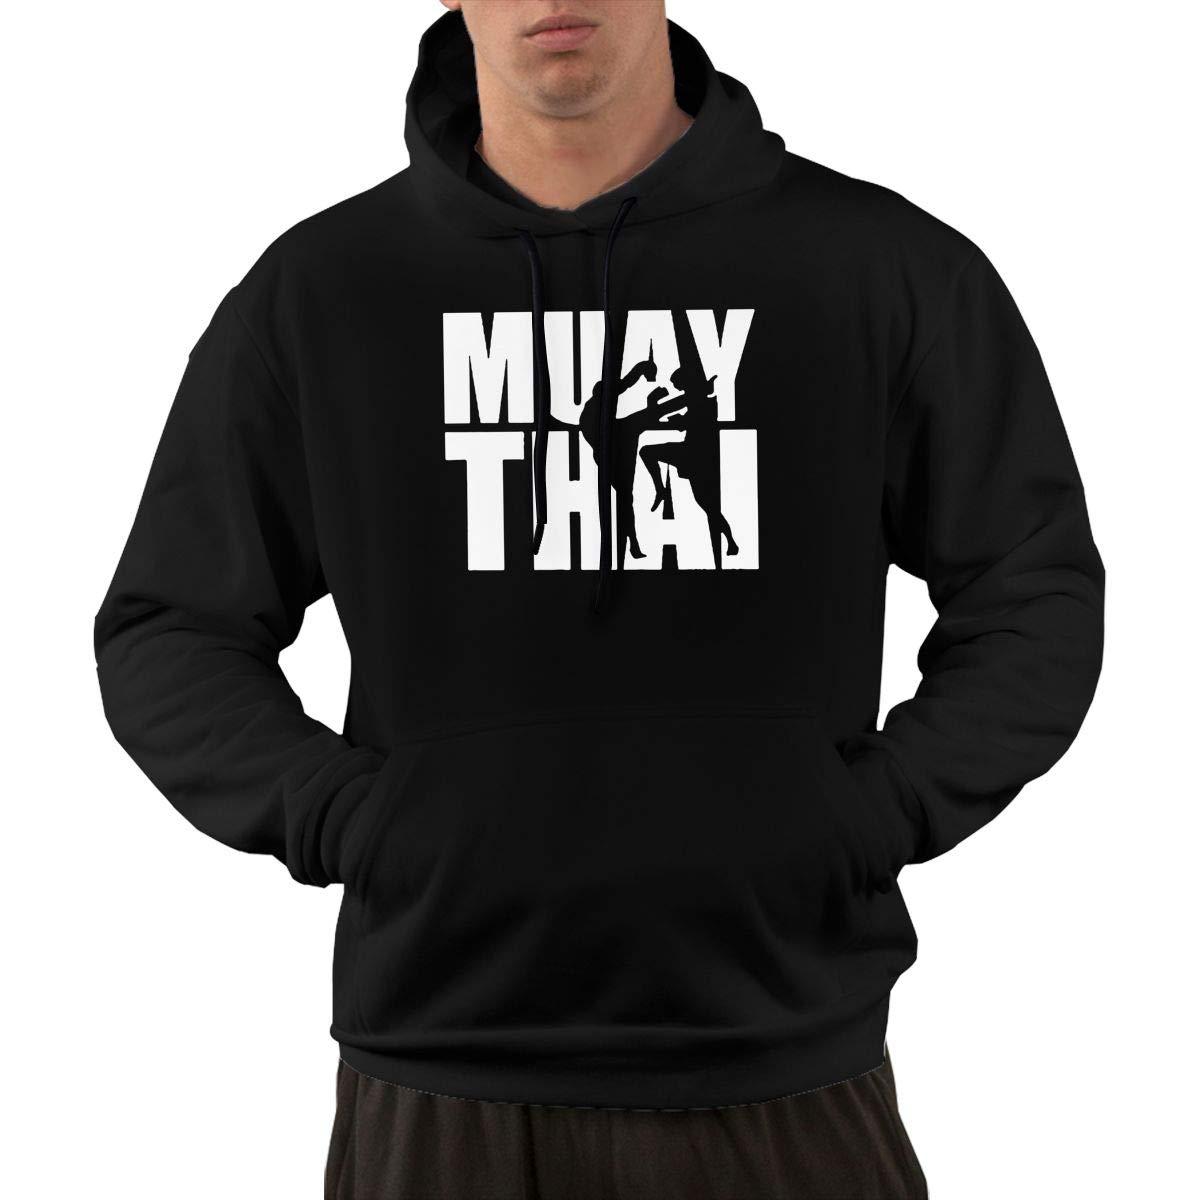 SweatMTK5 Muay Thai Retro Men Hooded Sweater CasualGreatcoat with Kanga Pocket Black